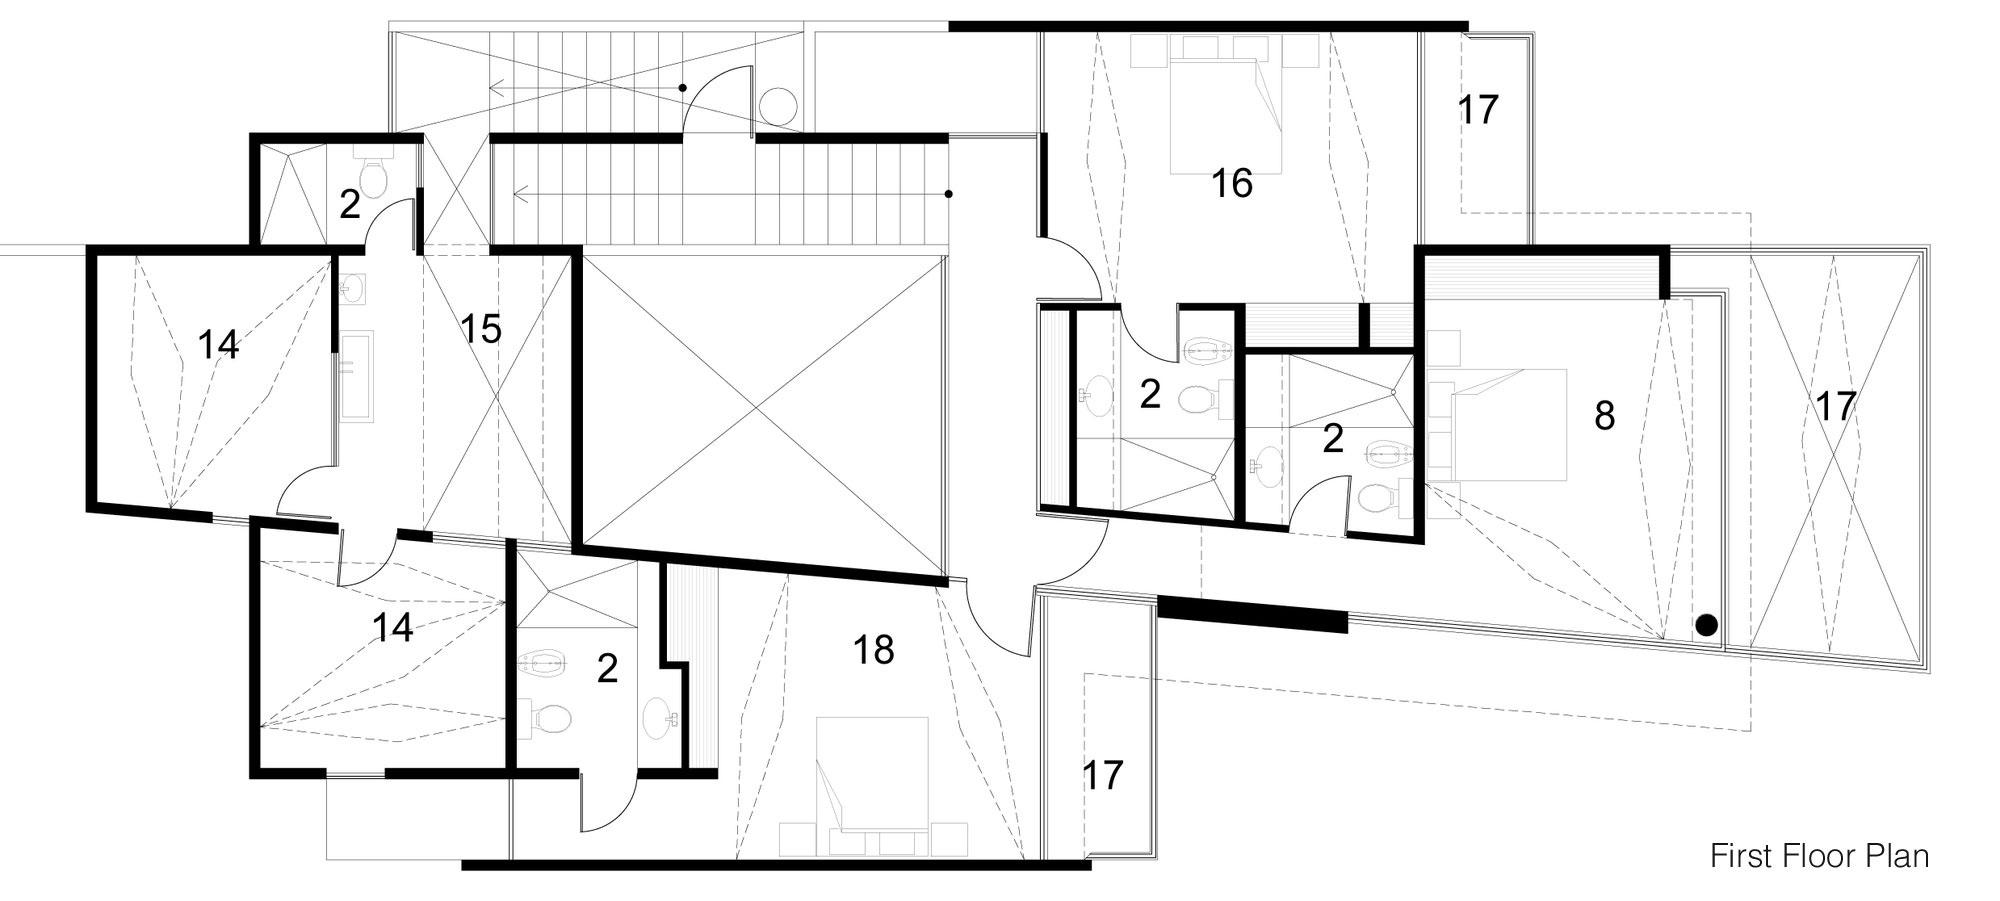 First Floor Plan, Tuunich Kanab in San Bruno, Mexico by Seijo Peon Arquitectos